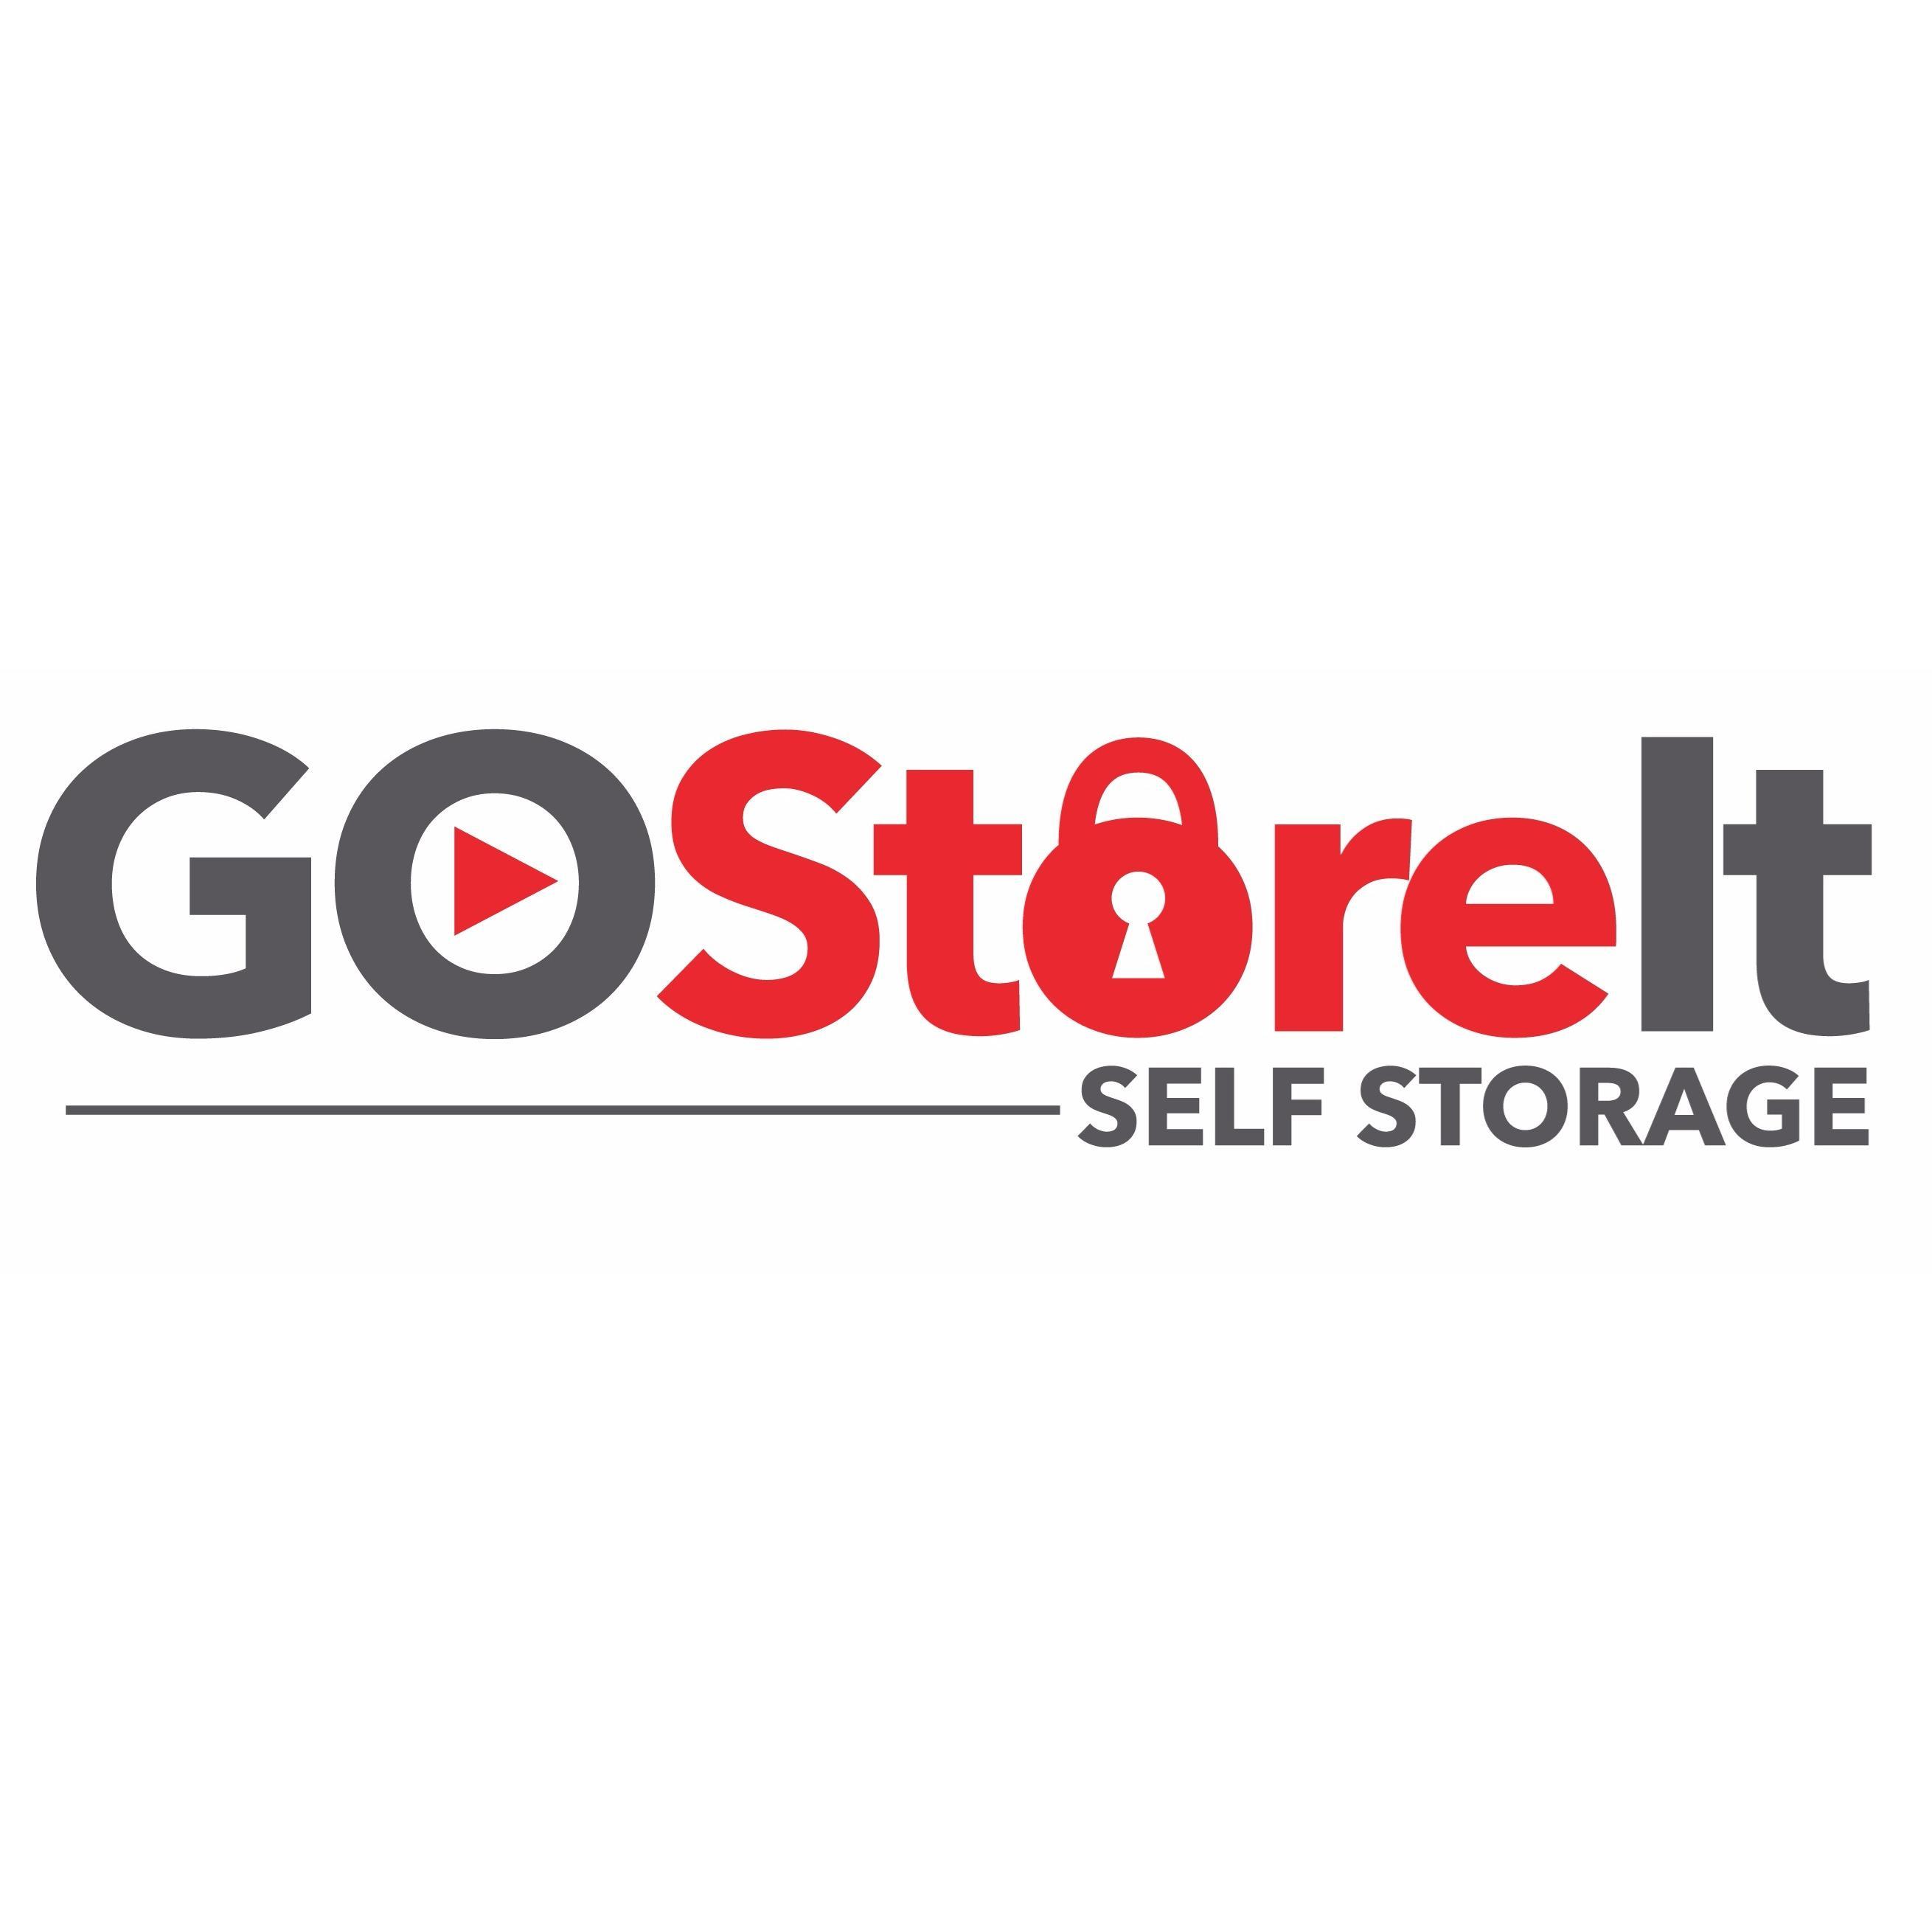 Go Store It - Pooler, GA - Self-Storage